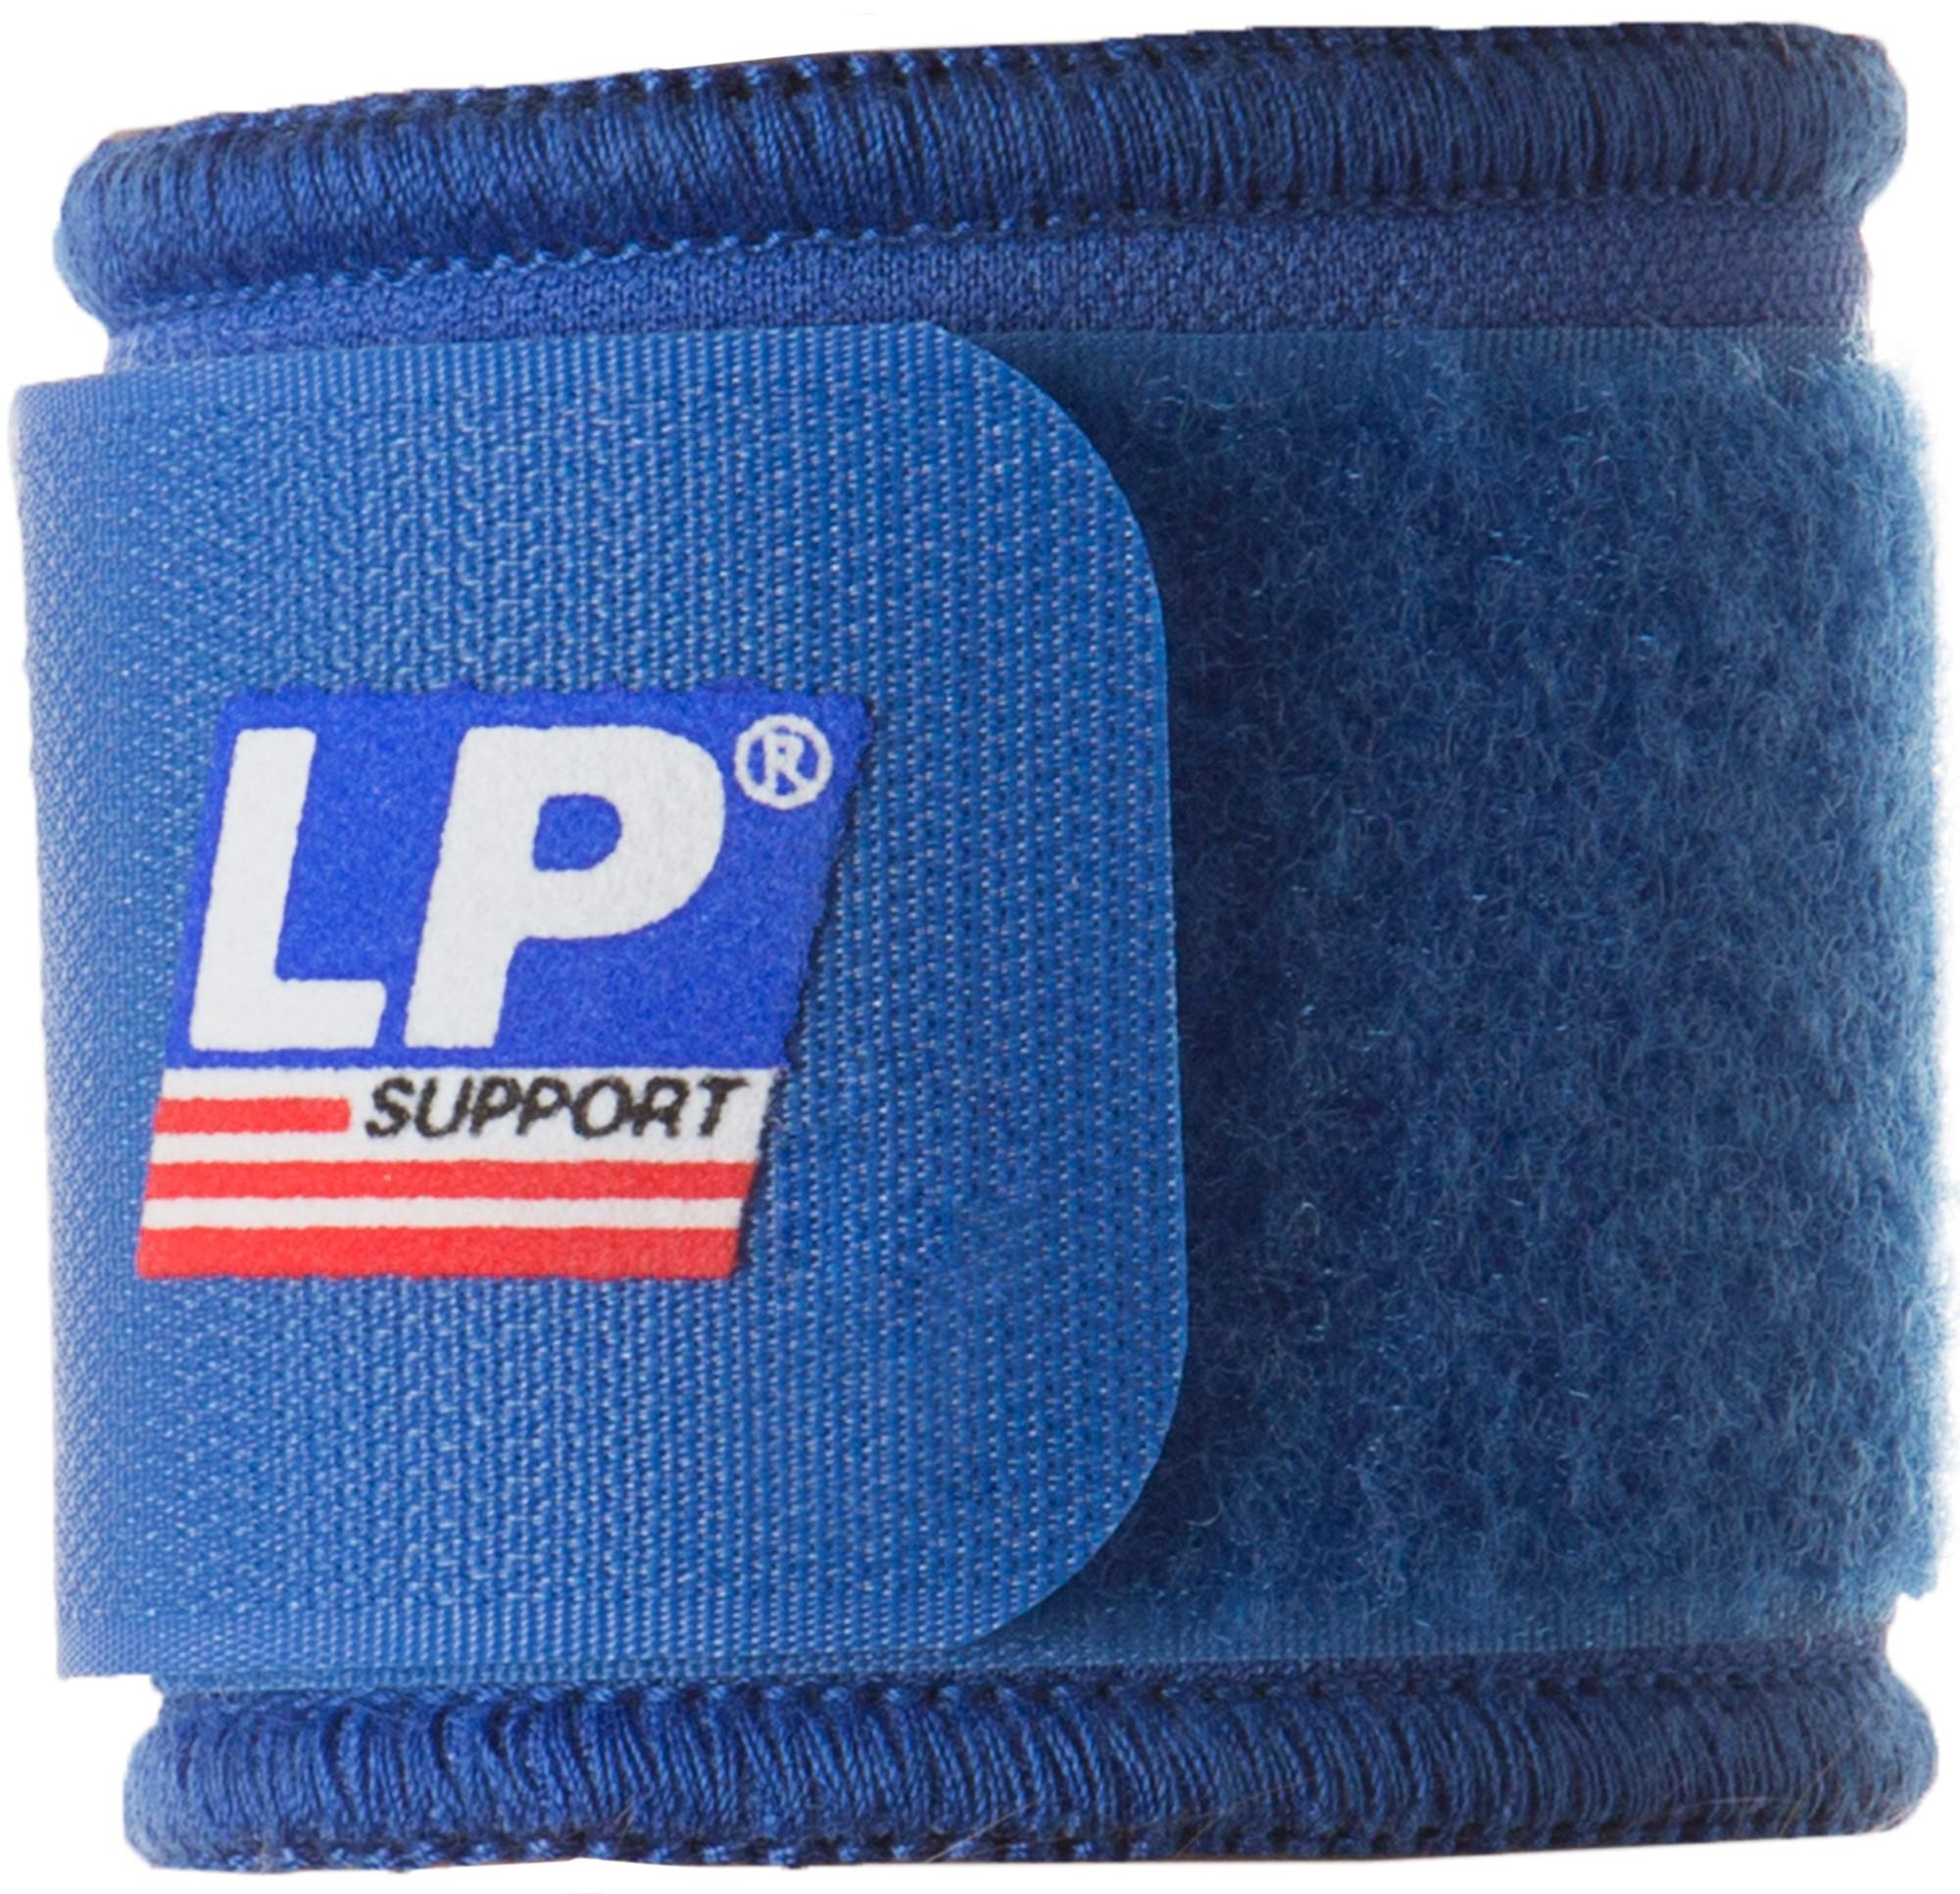 LP Support Суппорт запястья LP 703  lp support суппорт локтя lp 751